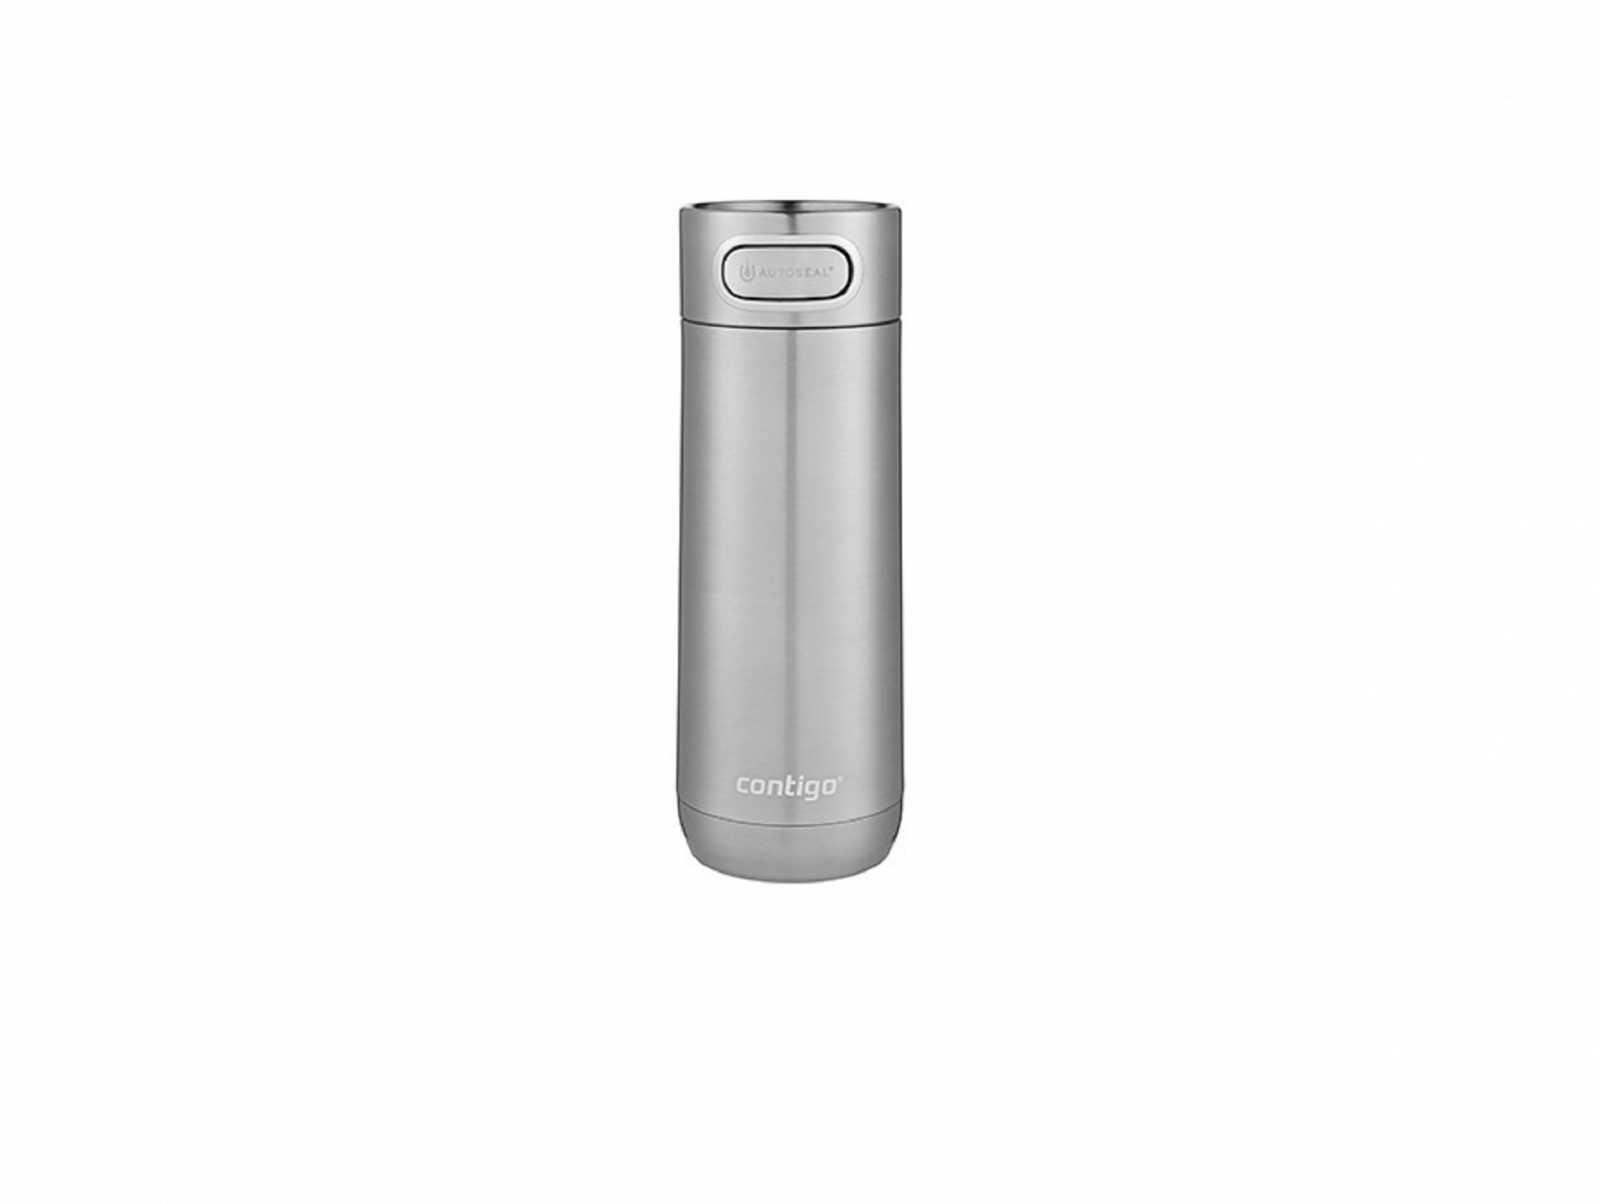 Онлайн каталог PROMENU: Термостакан Contigo LUXE Stainless Steel, объем 0,36 л, серебристый Contigo 2104367